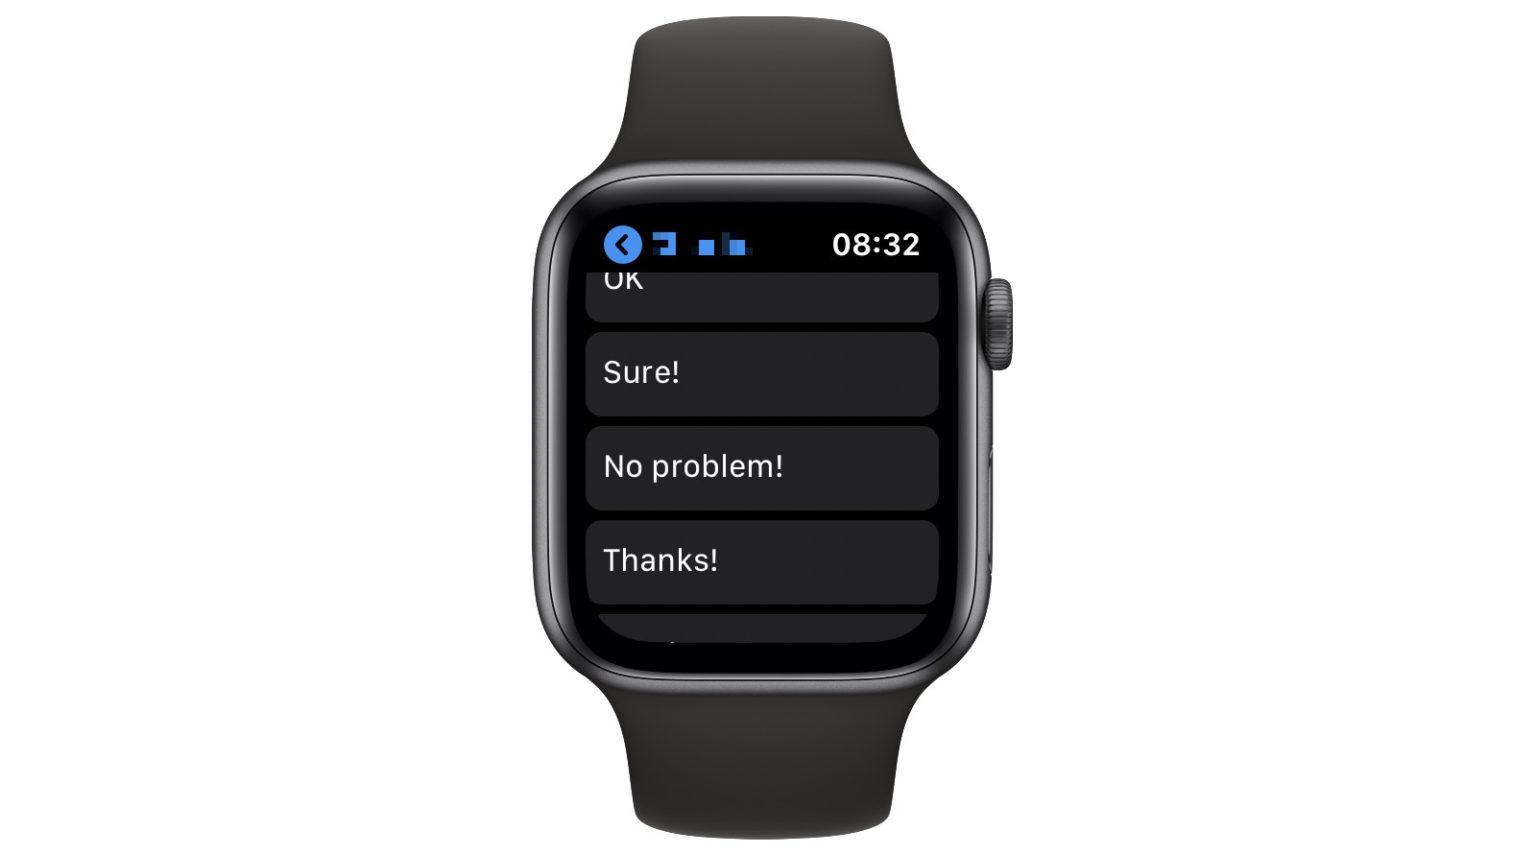 Change the lame Apple Watch smart replies by adding custom replies.